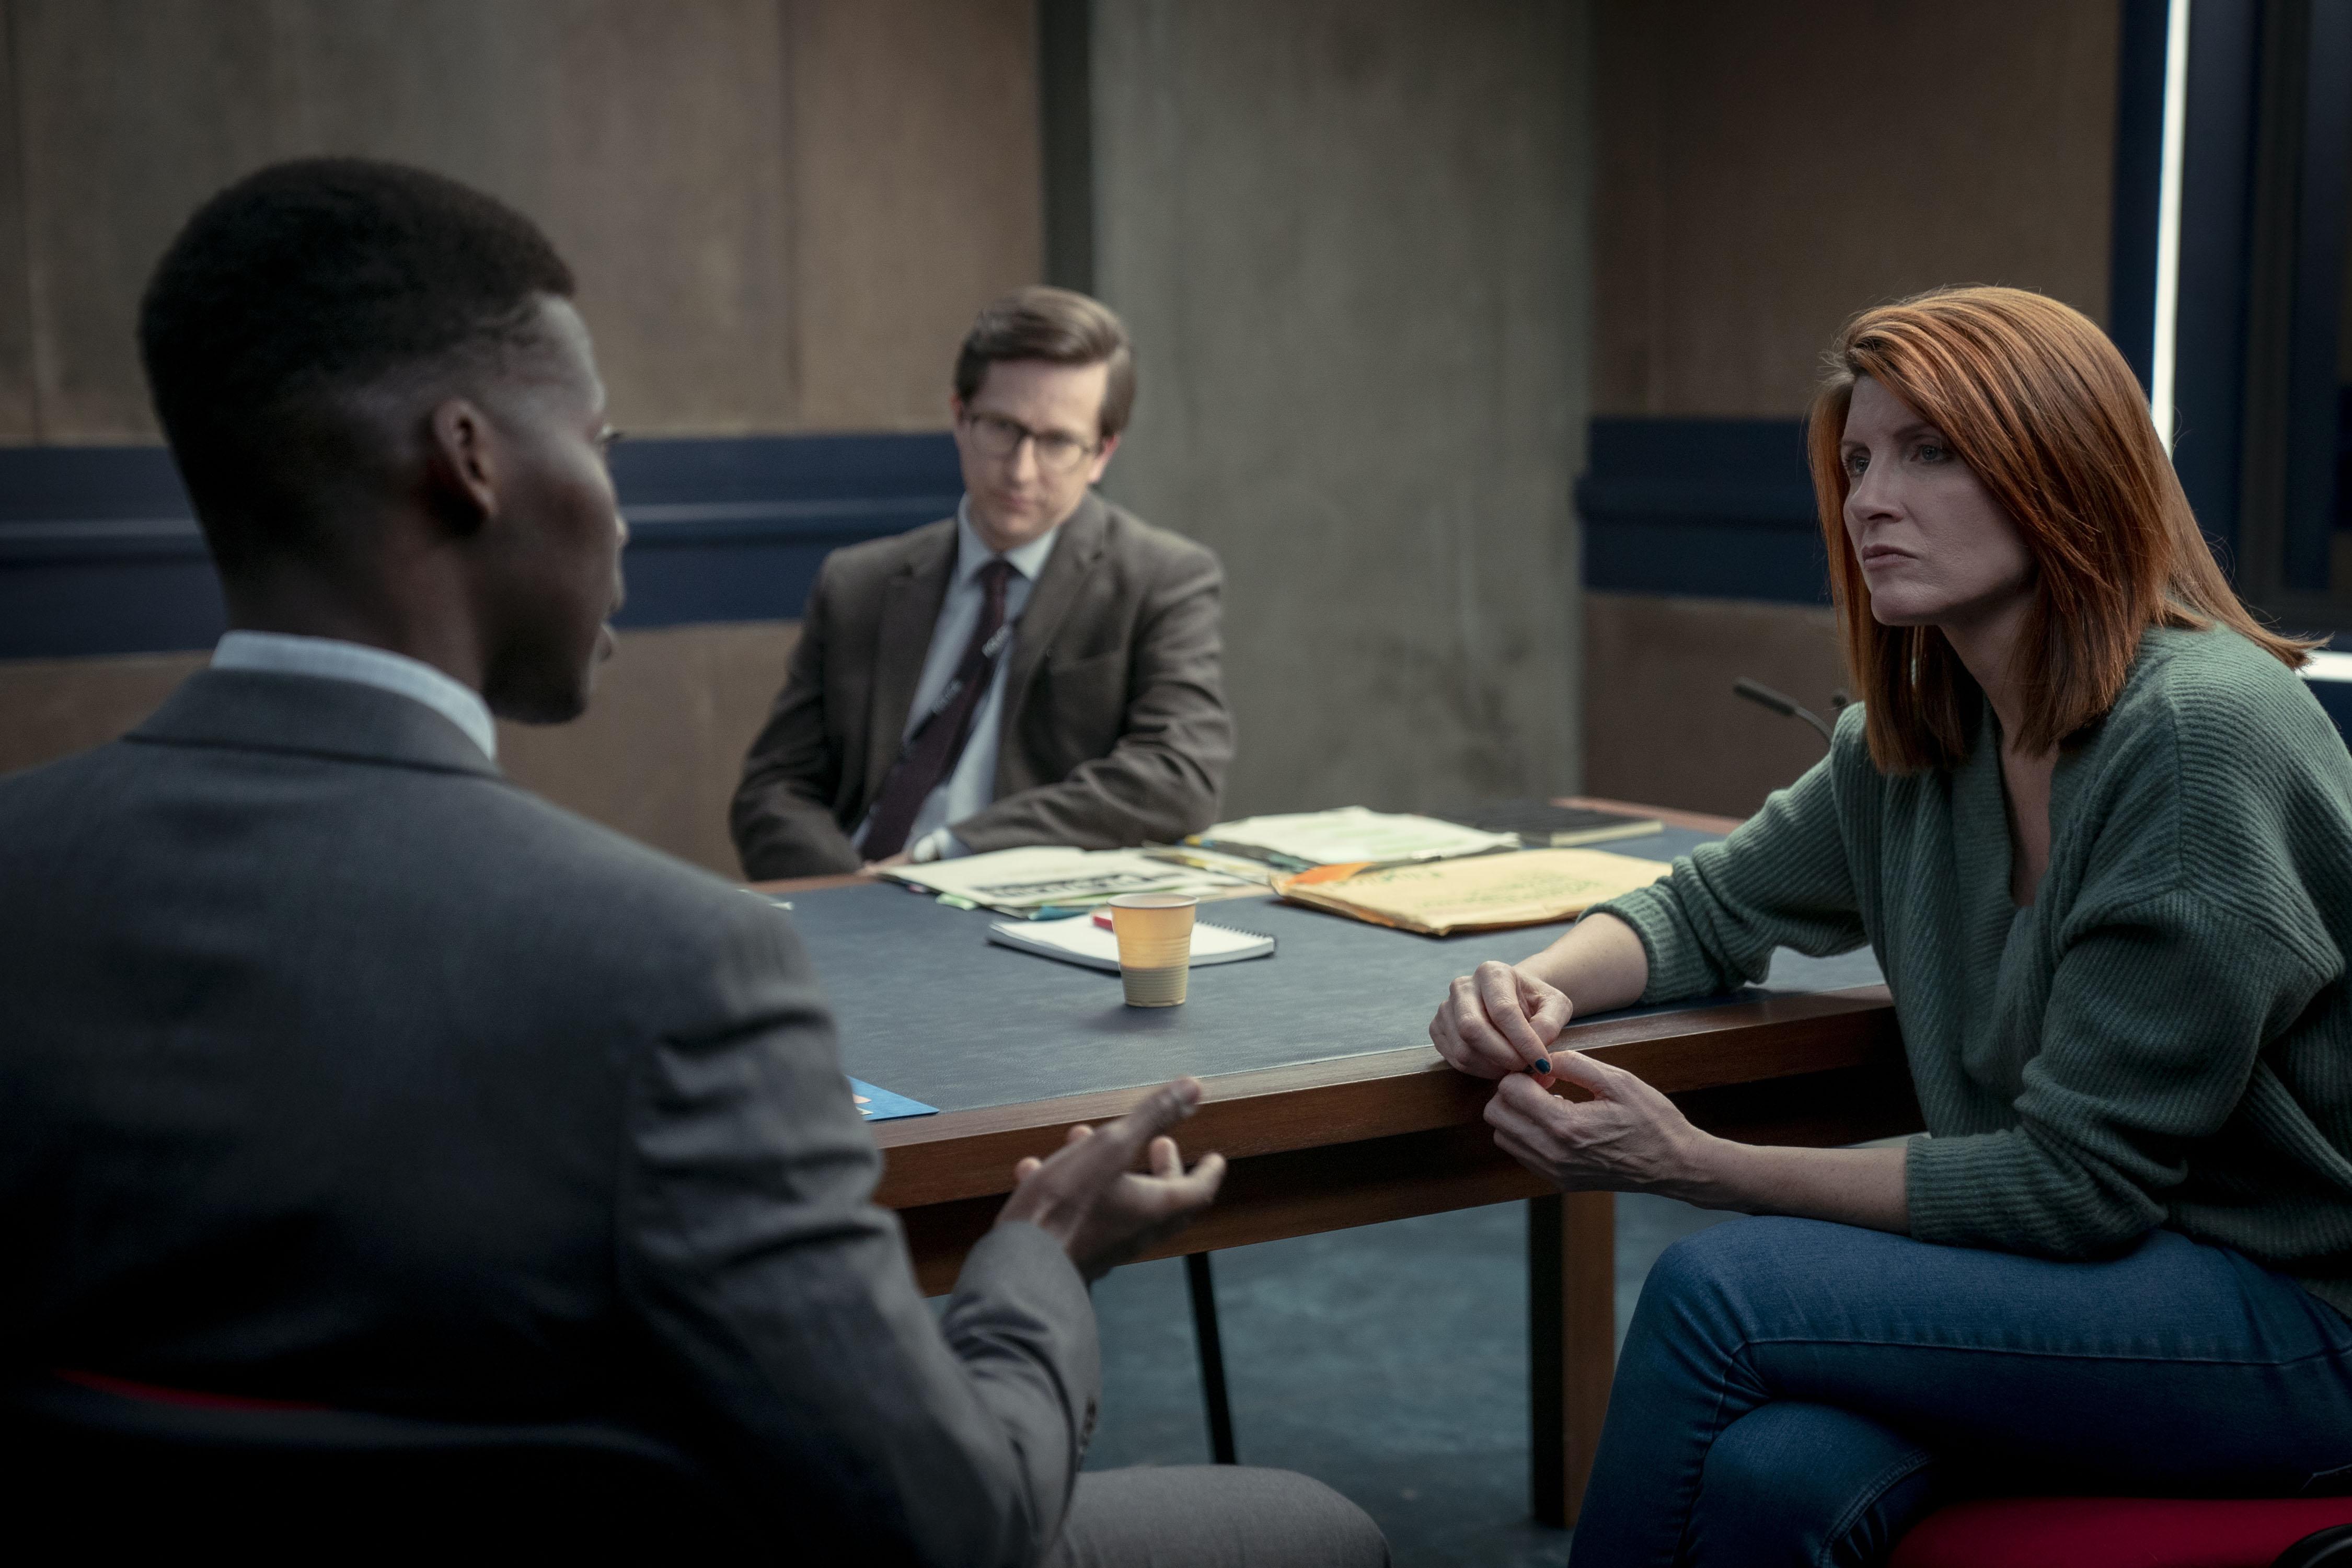 Criminal UK S2. Picture shows: (L-R) Henry Regis (JYUDDAH JAYMES), Tony Myerscough (LEE INGLEBY) and Danielle Dunne (SHARON HORGAN).